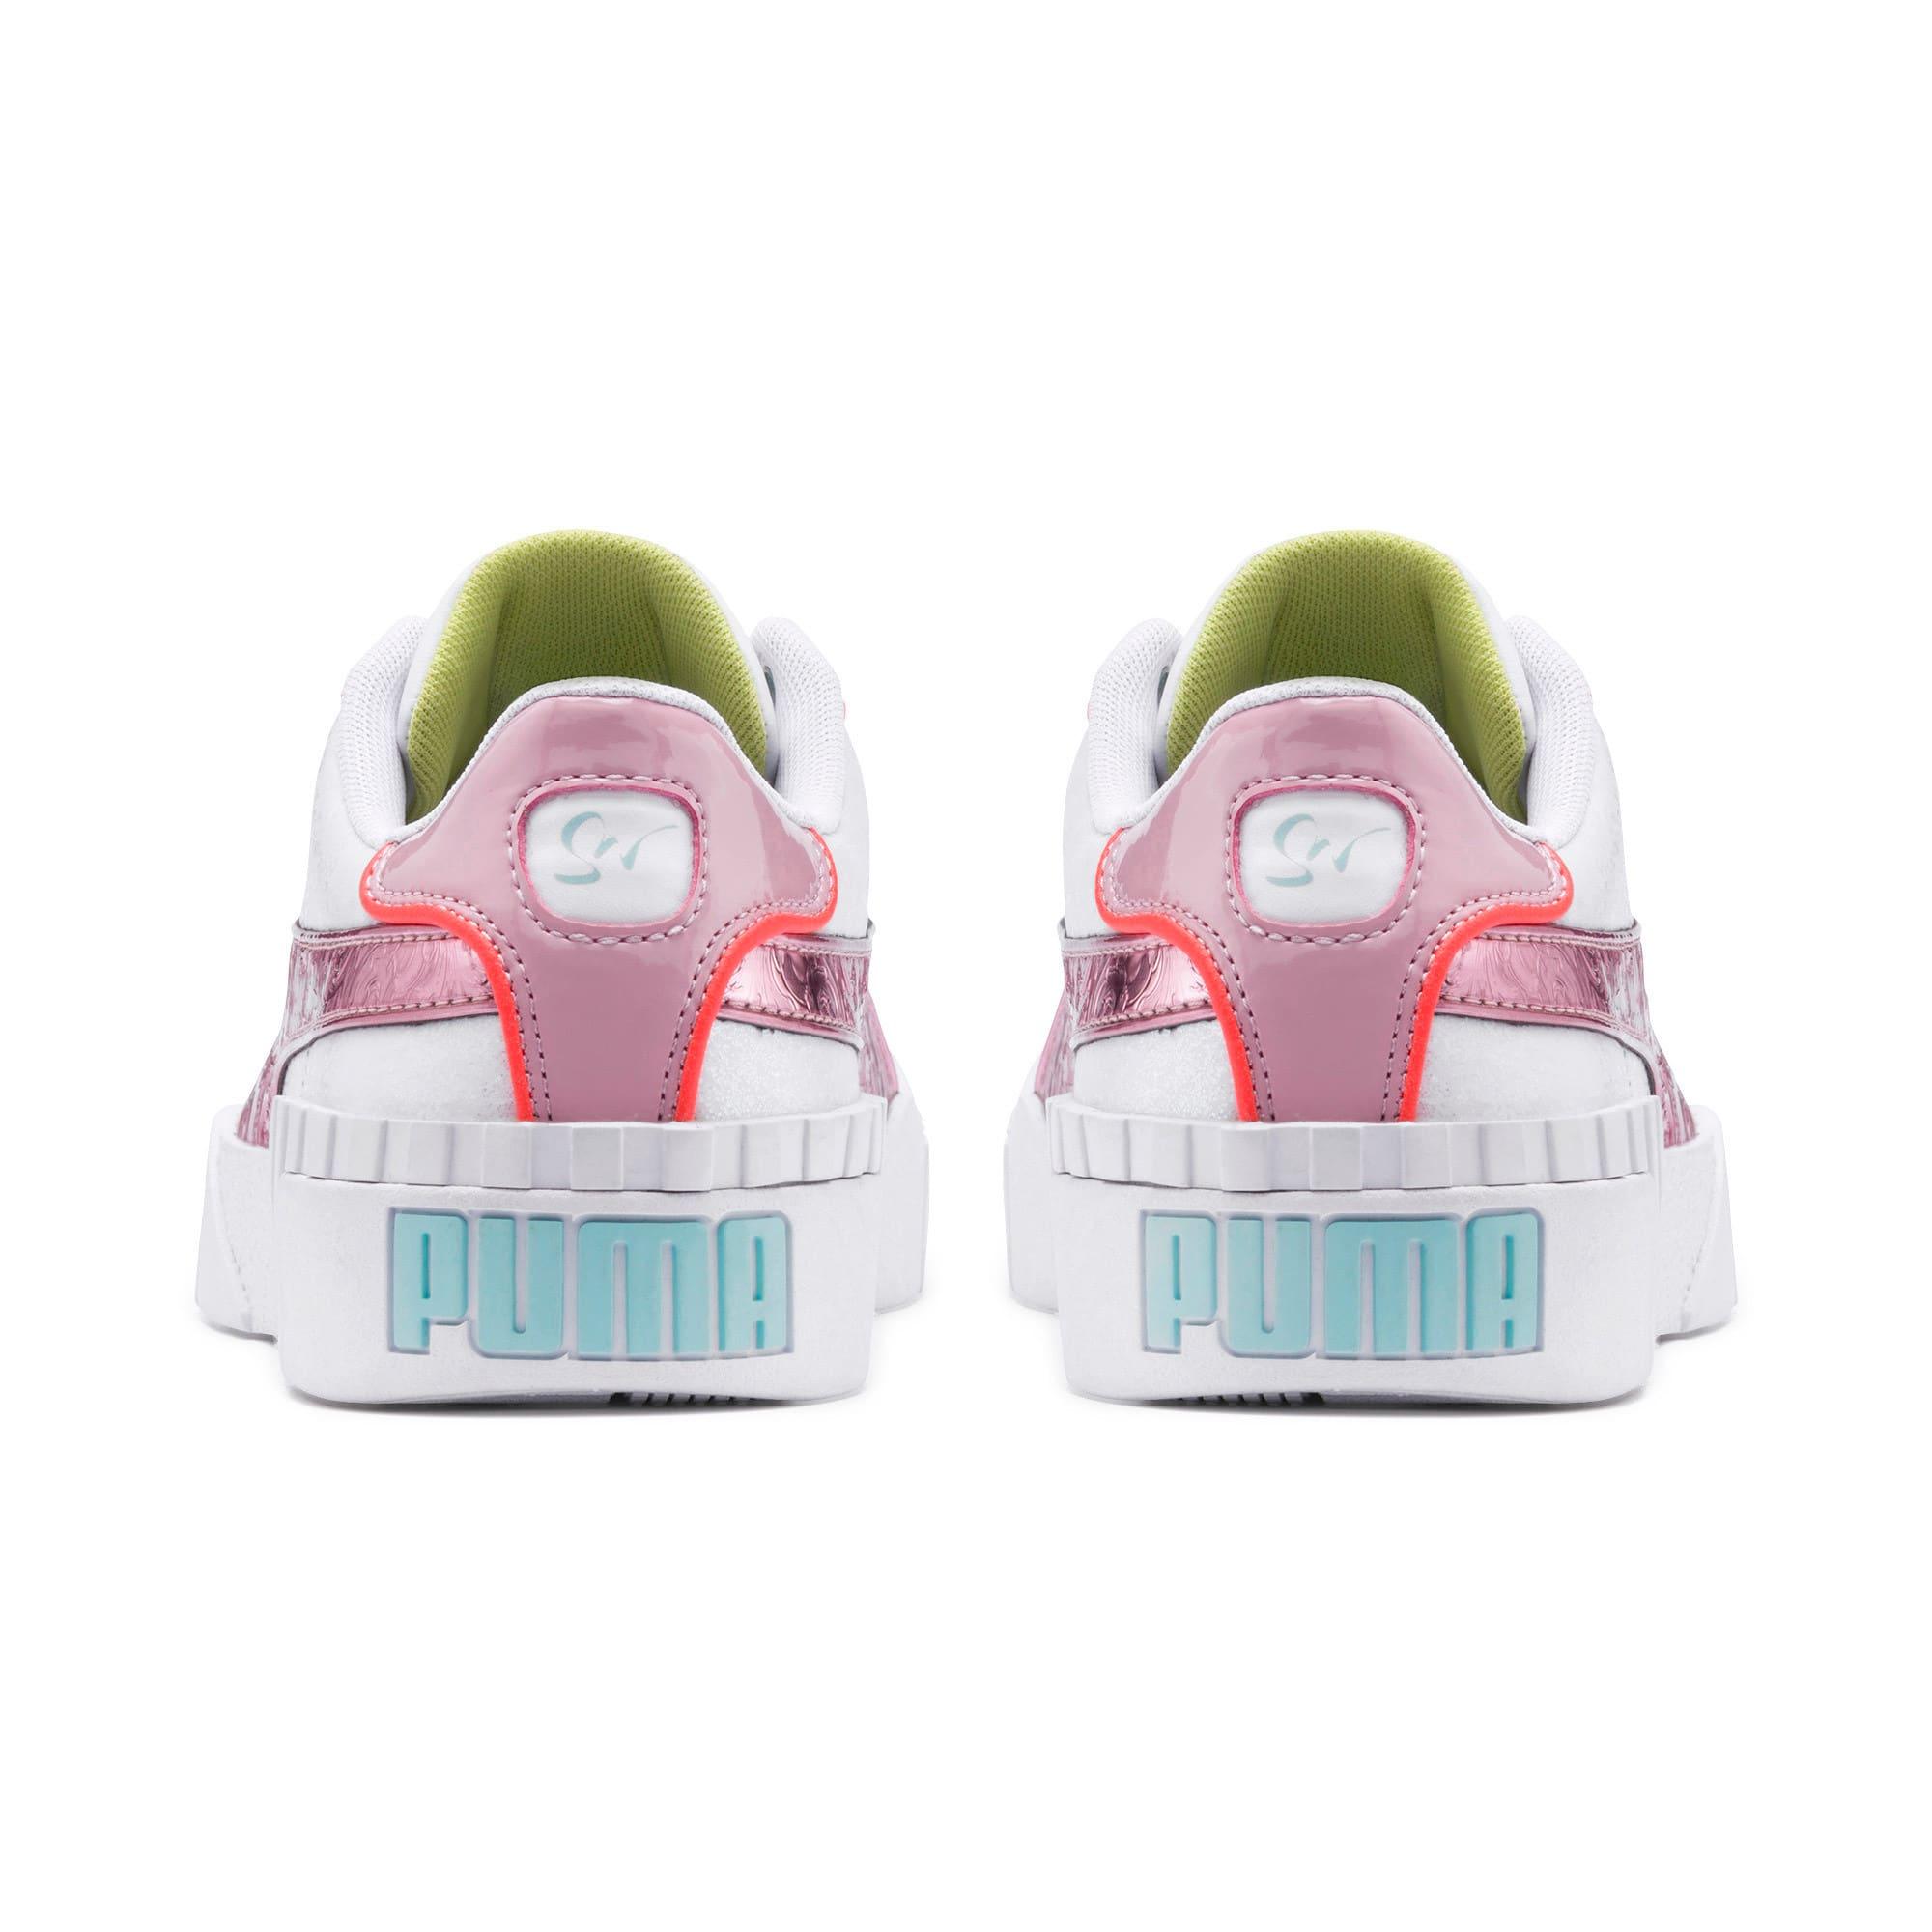 Thumbnail 3 of PUMA x SOPHIA WEBSTER Cali Women's Sneakers, Puma White-Pale Pink, medium